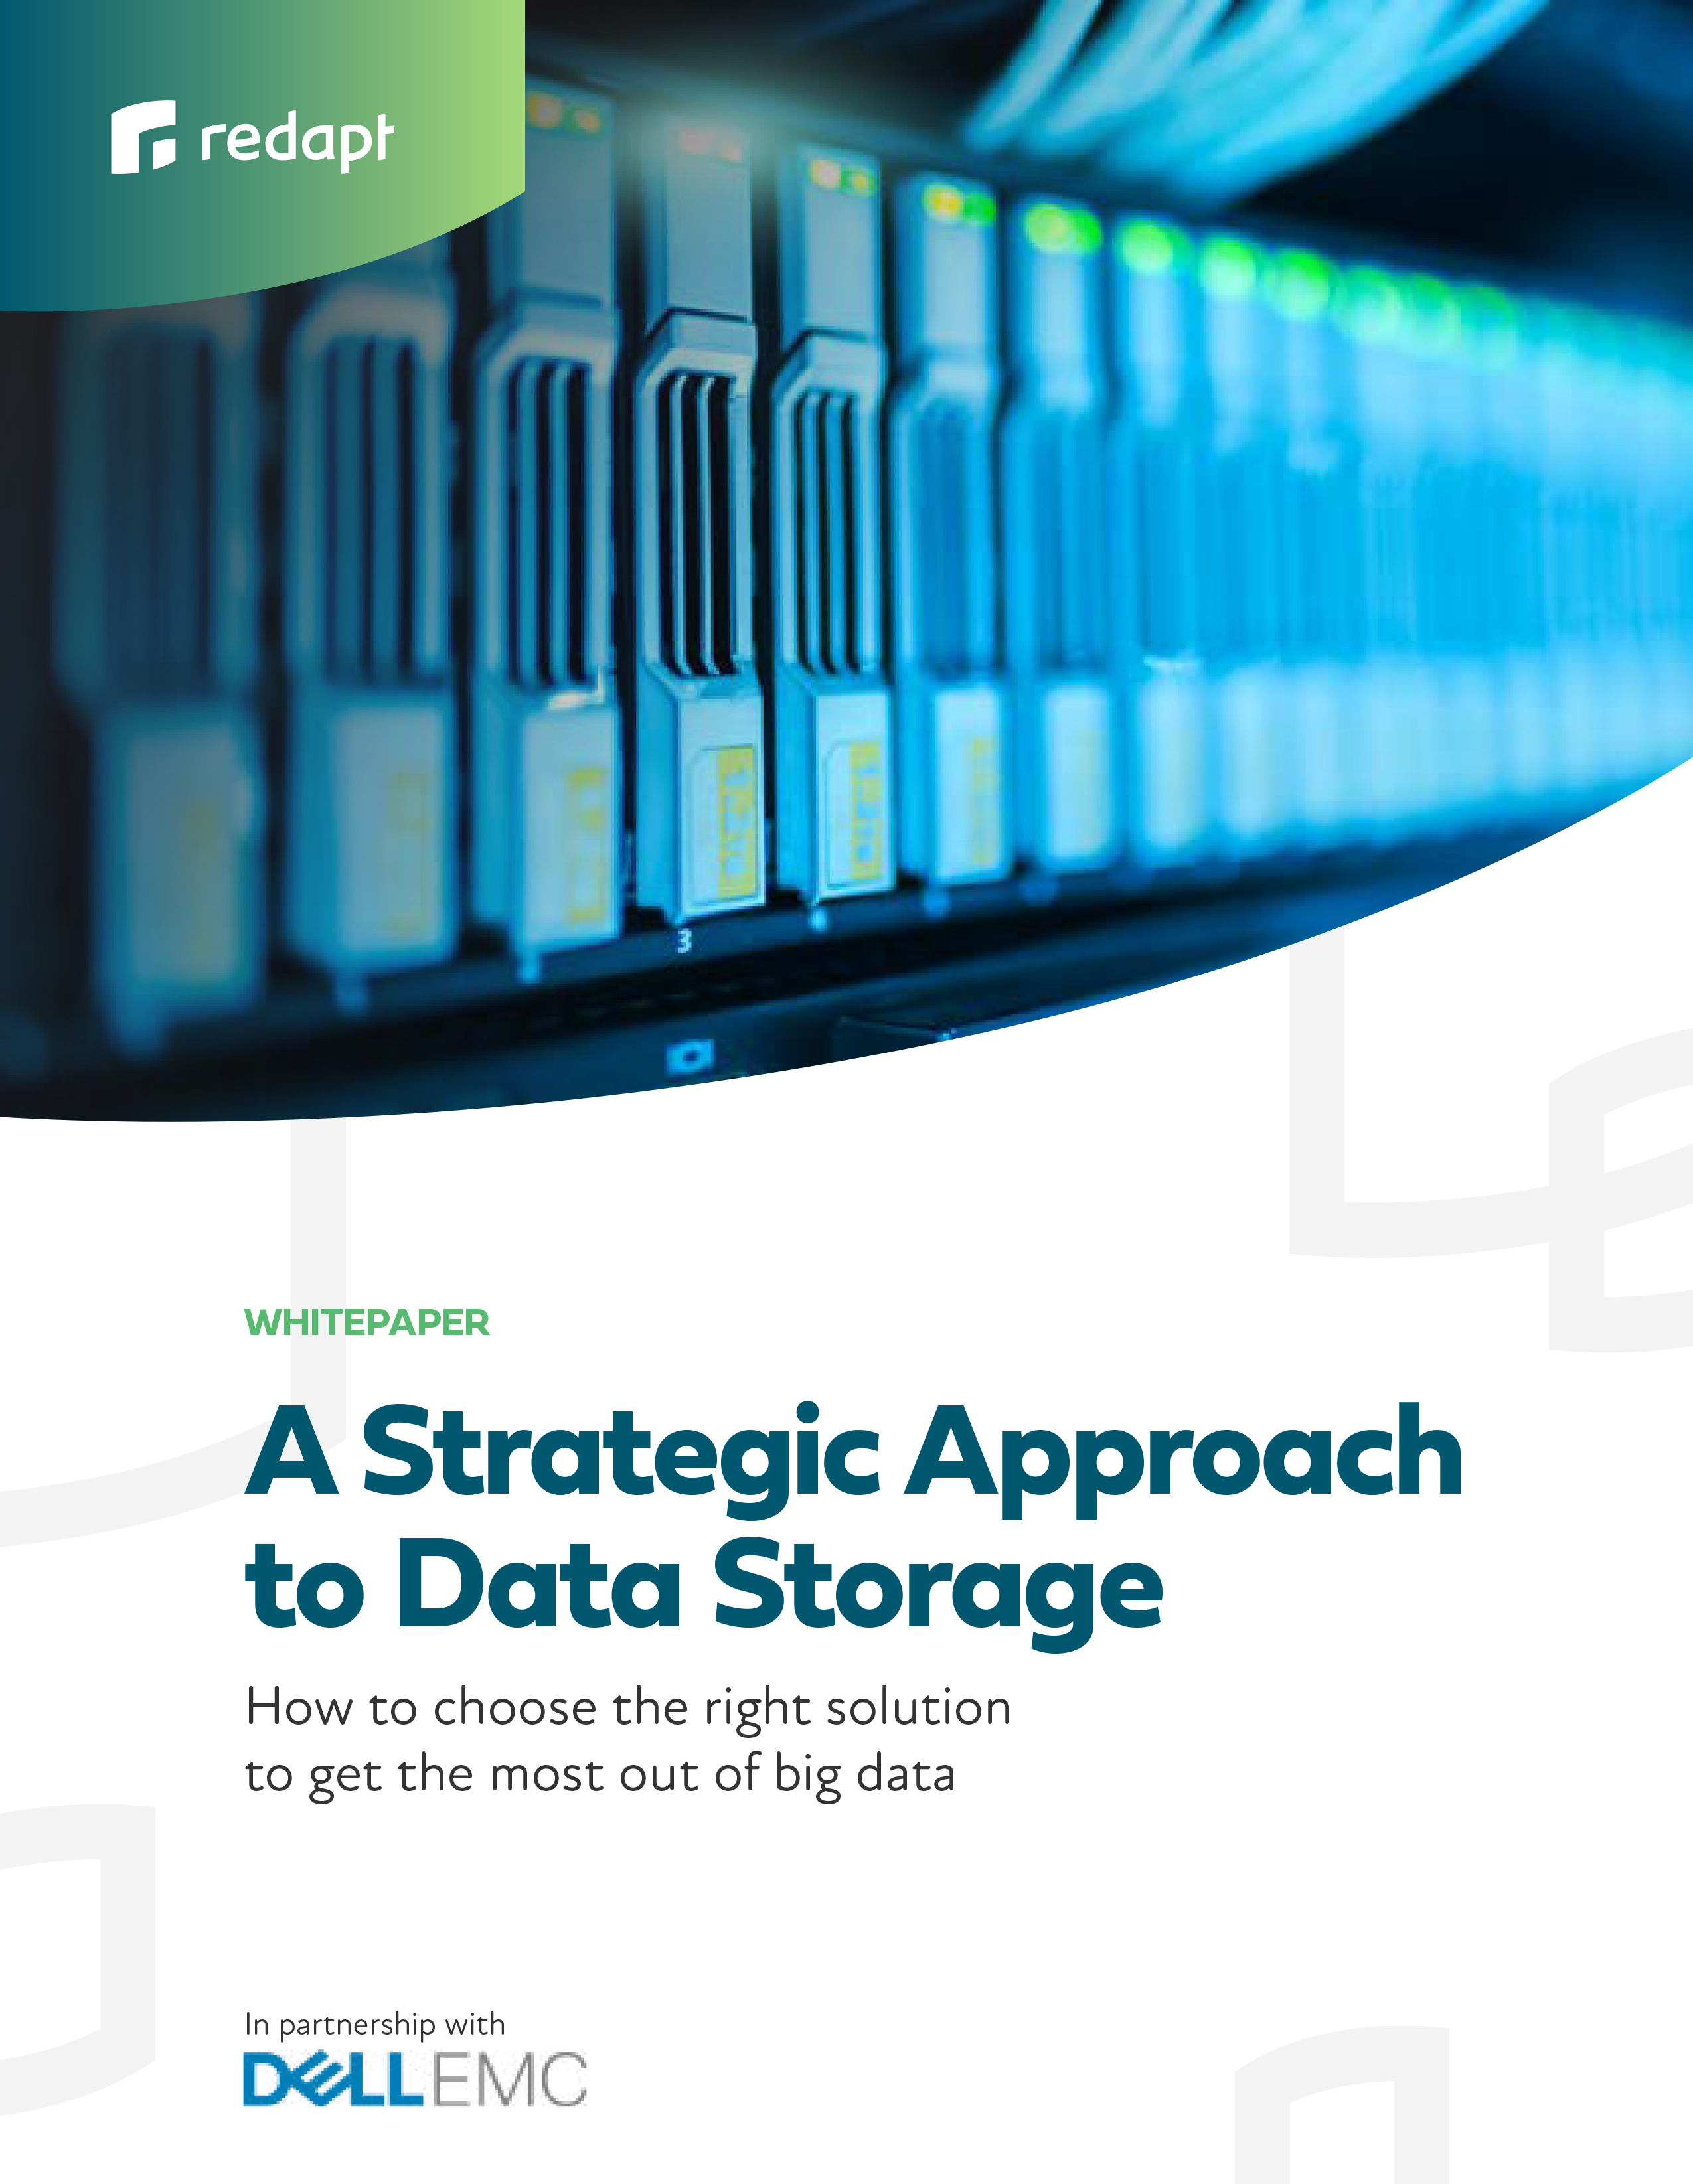 data storage white paper cover